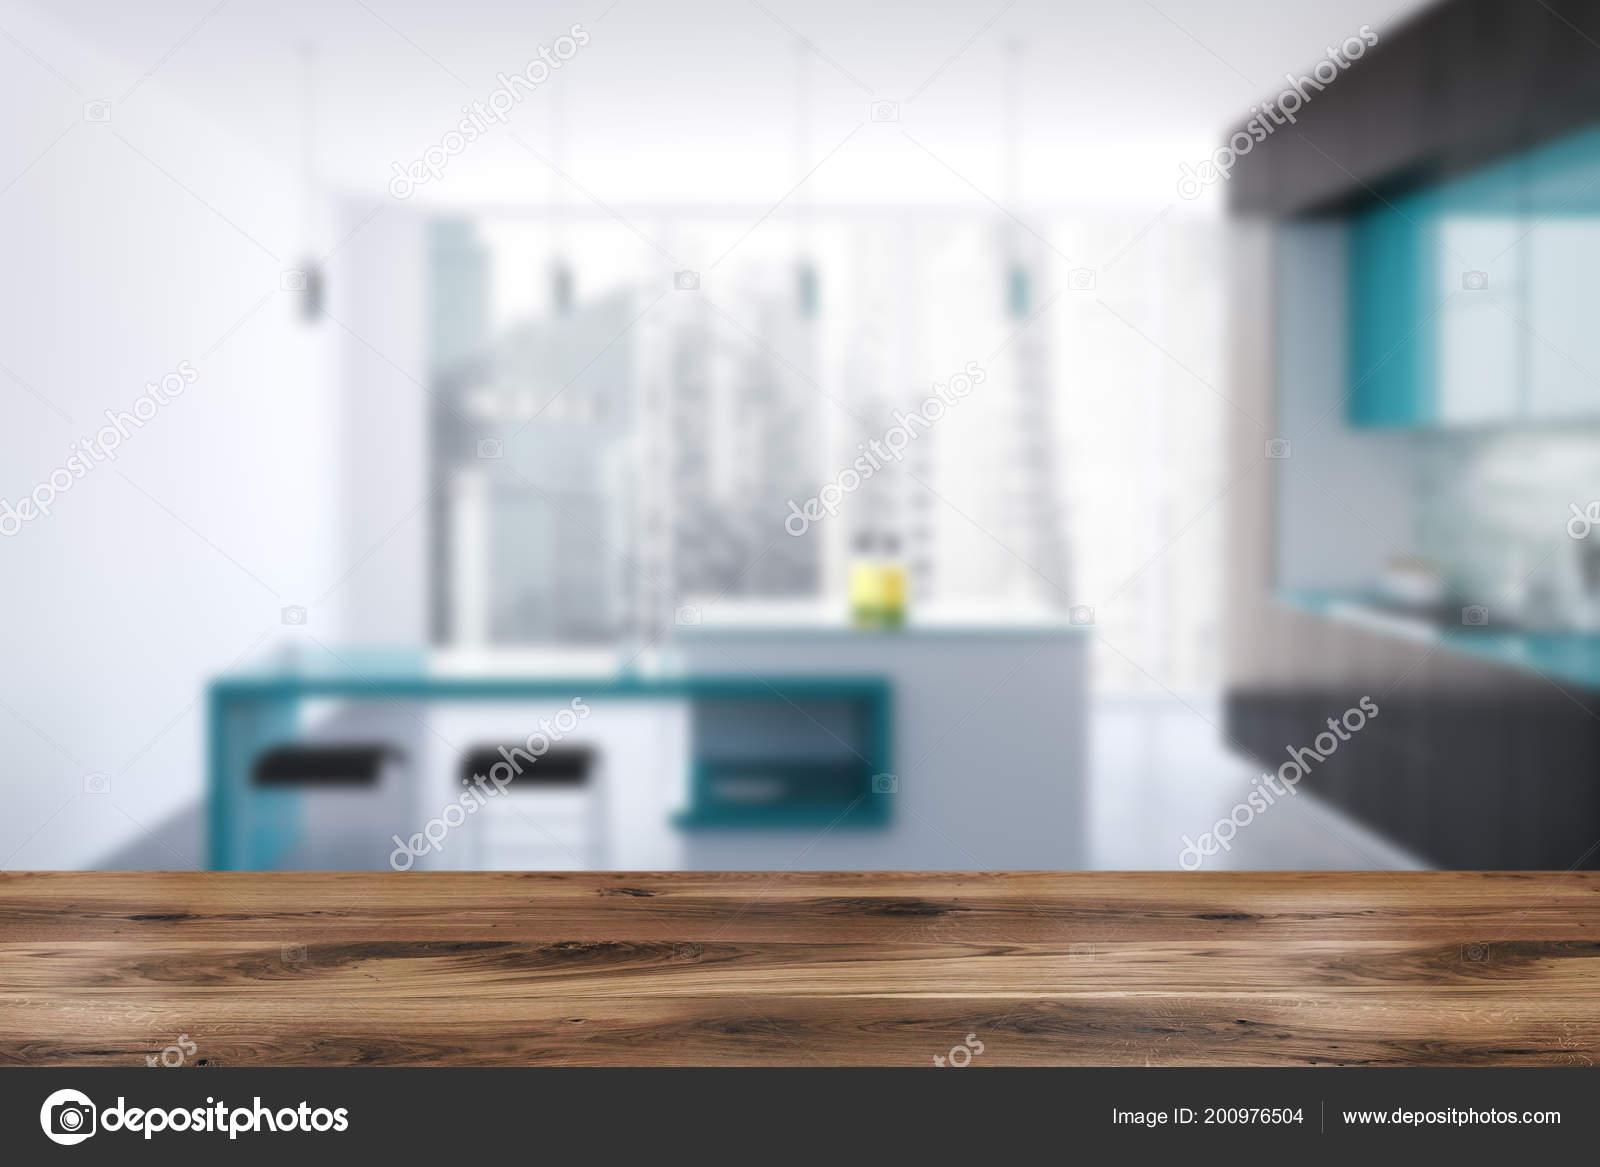 primal kitchen bars table and bench 黑白原始厨房内部有混凝土地板黑色和蓝色台面和全景窗口渲染模拟模糊 黑白原始厨房内部有混凝土地板 黑色和蓝色台面和全景窗口 酒吧 3d 渲染模拟模糊 照片作者denisismagilov